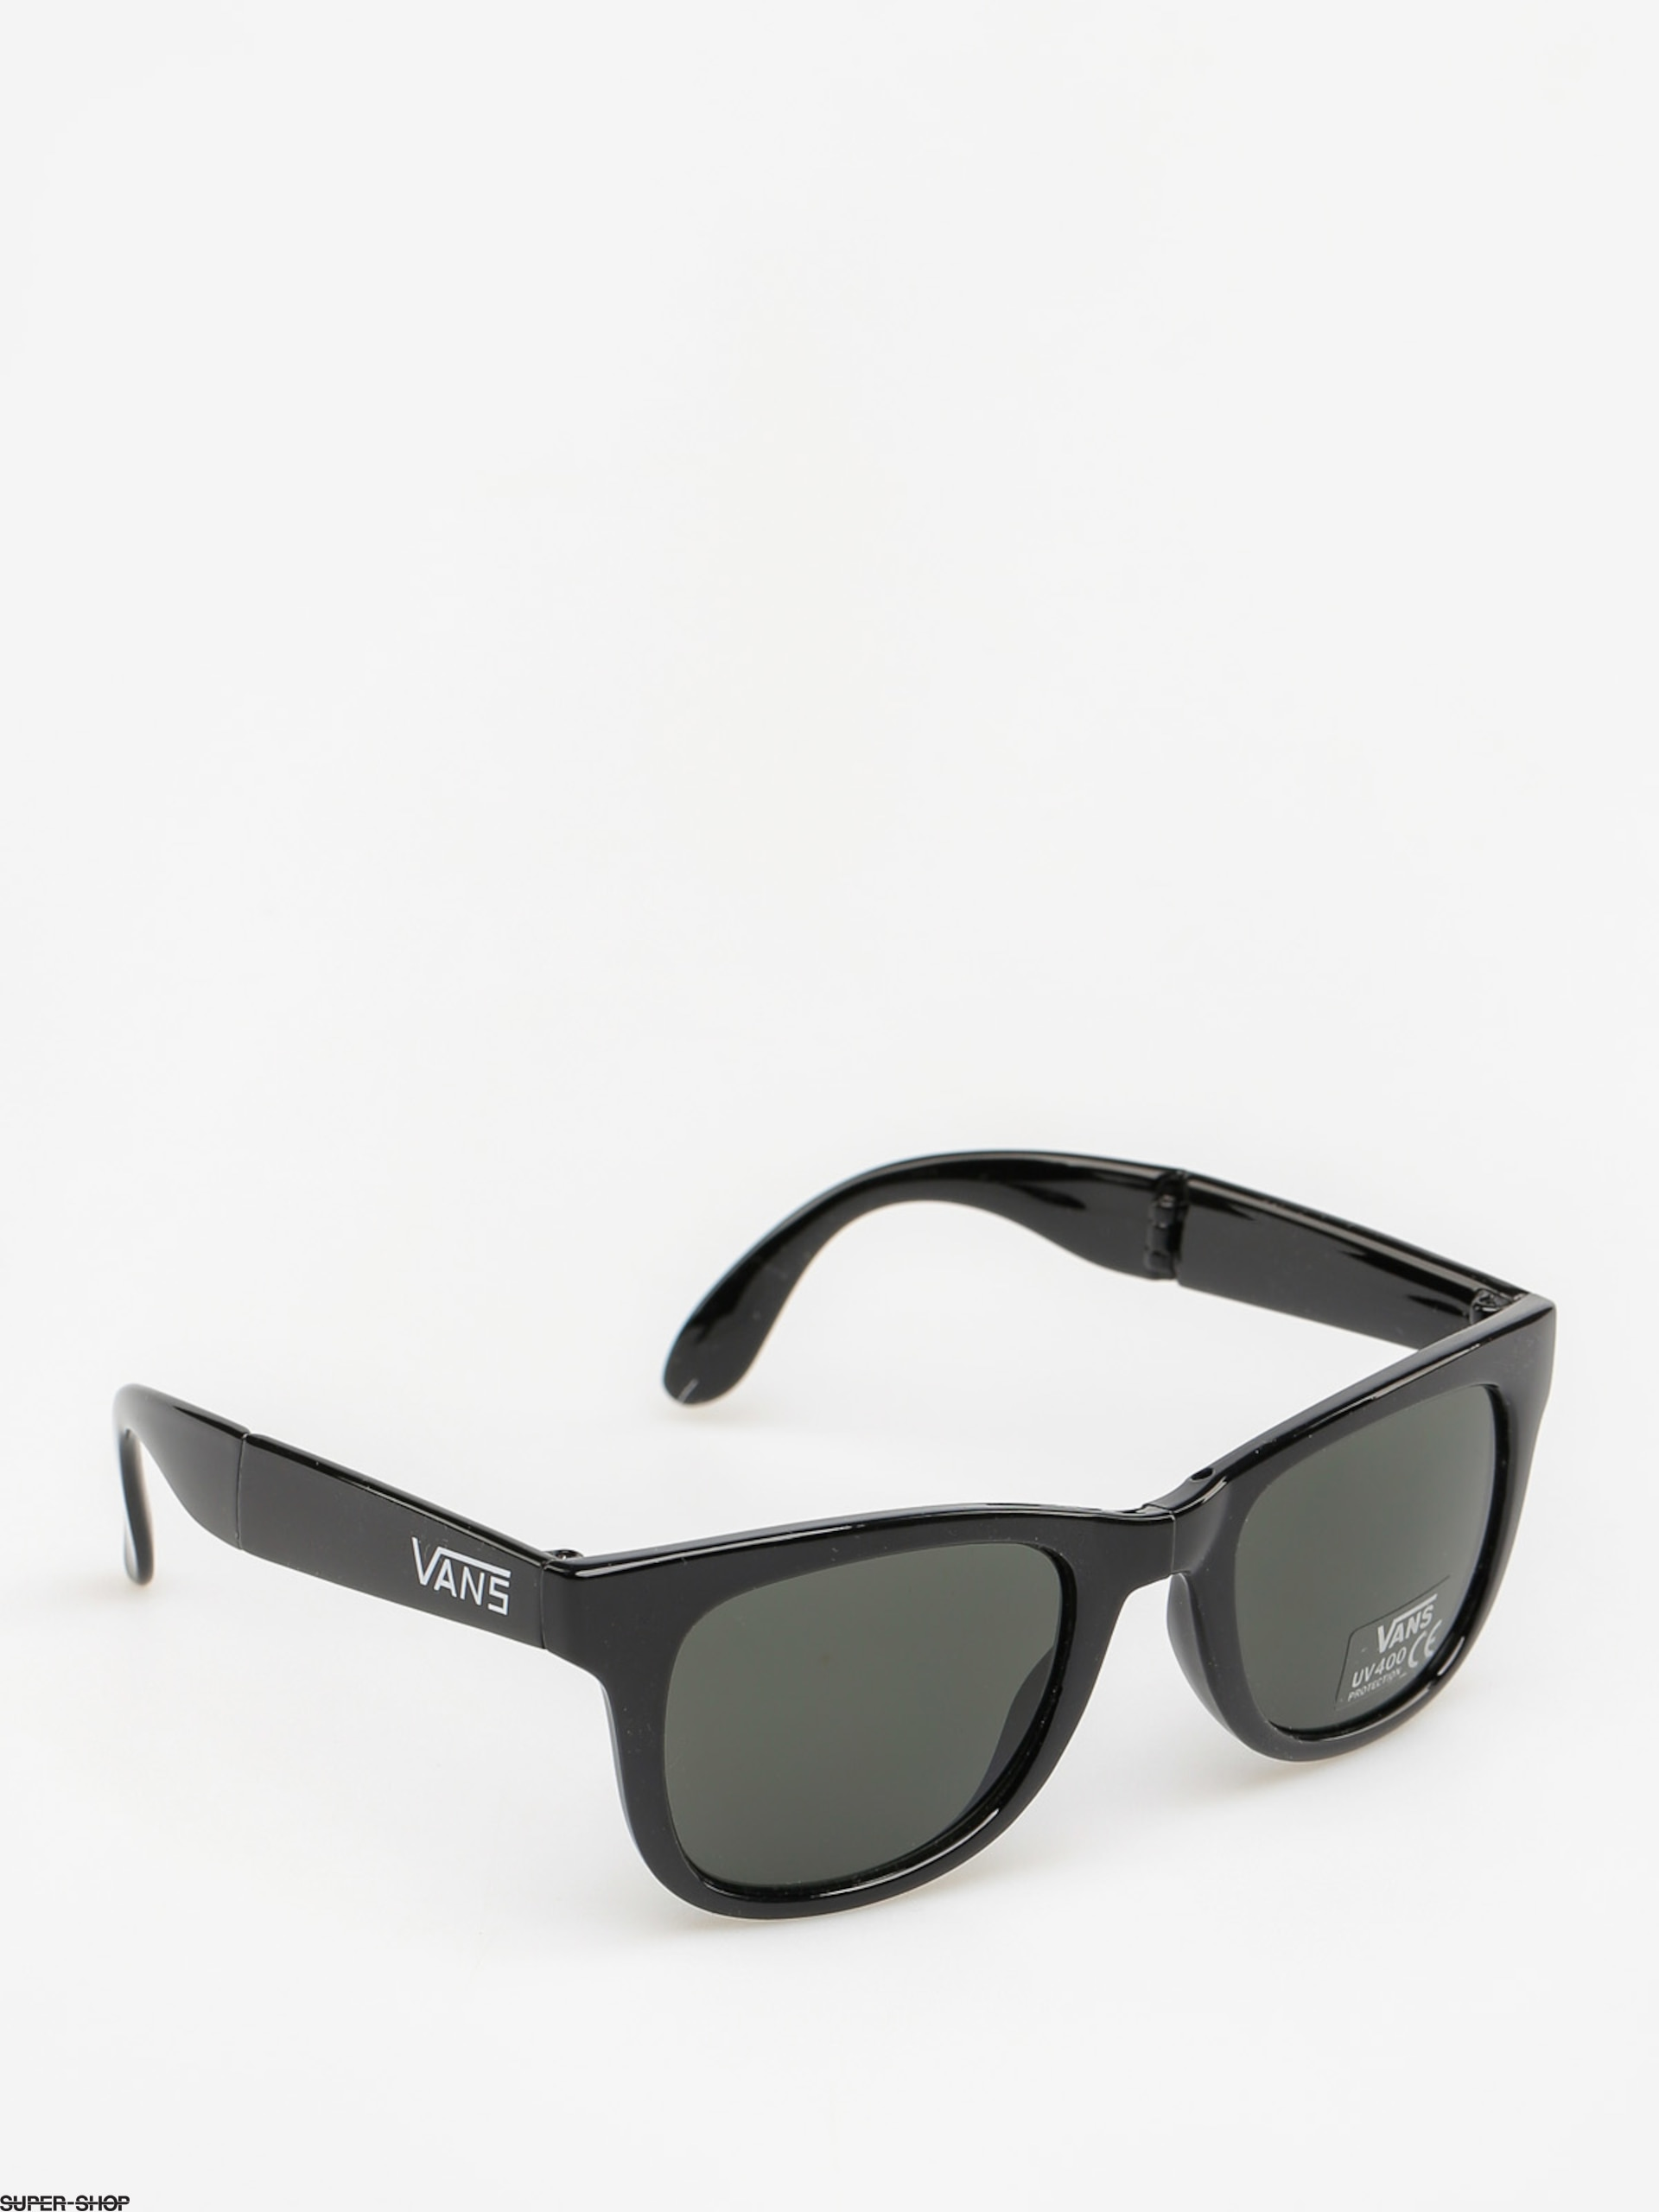 5d804e037b1a Vans Sunglasses Foldable Spicoli (black gloss)